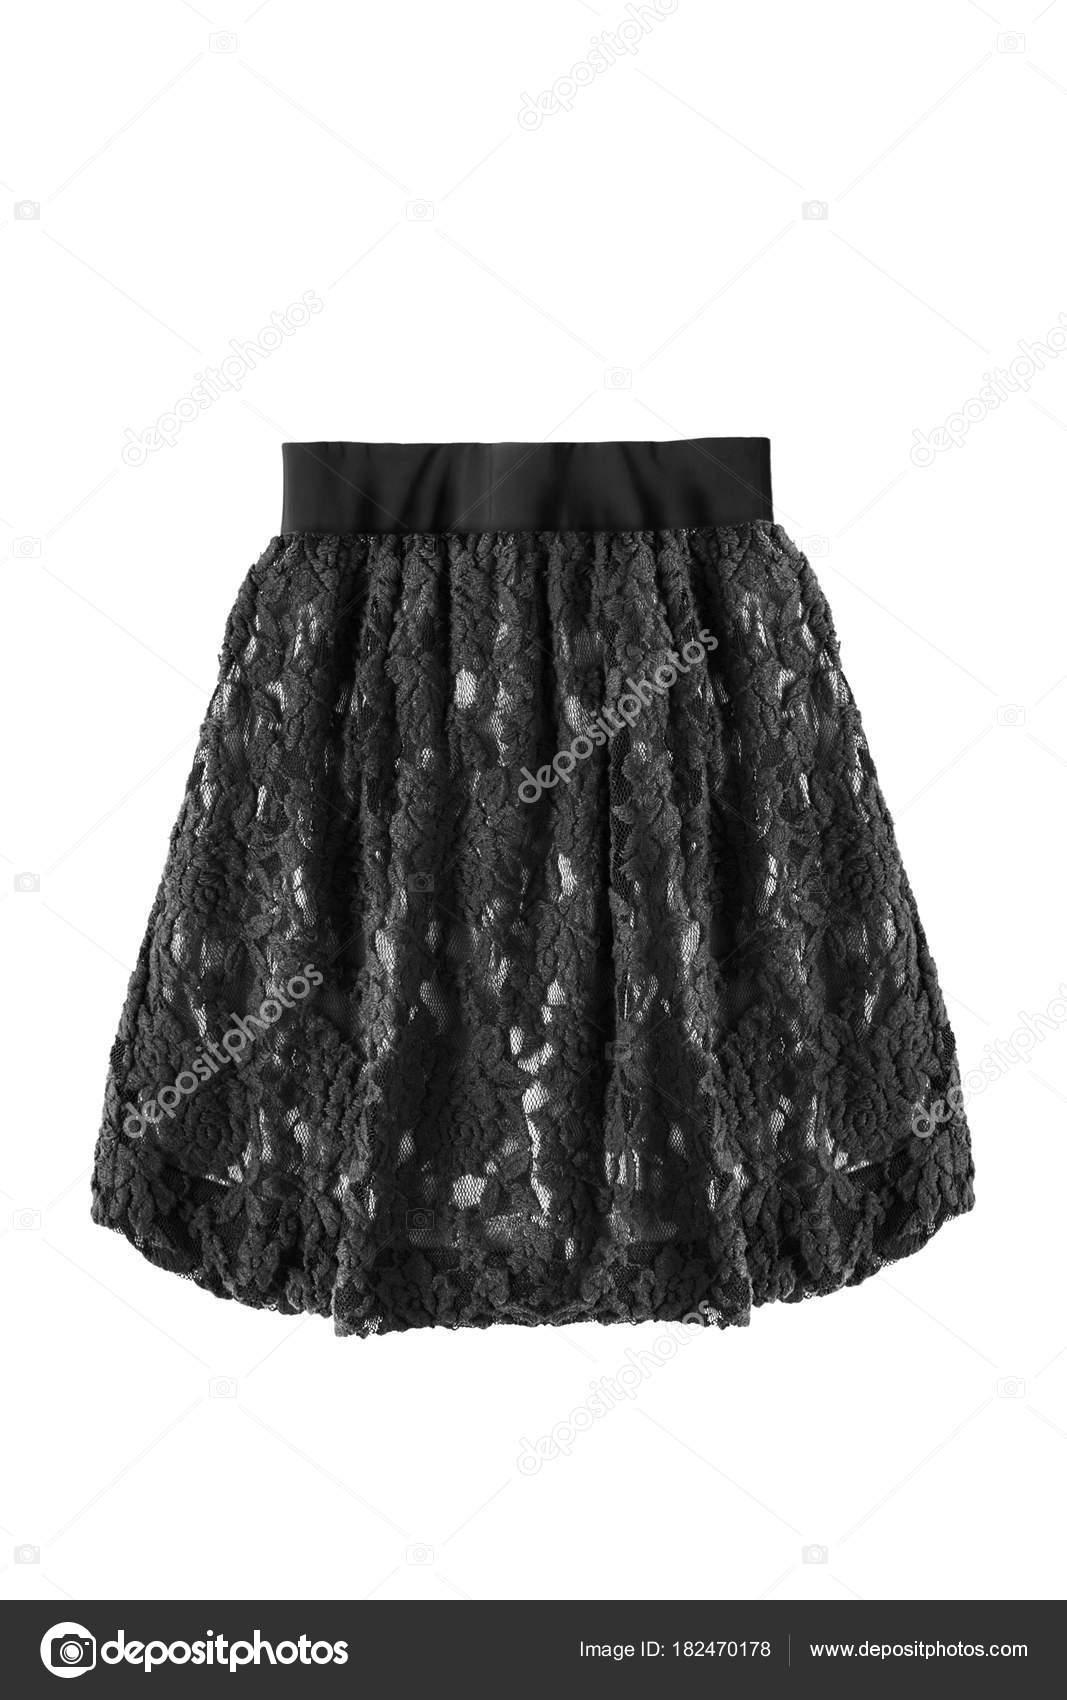 b3c5510dd626ac Zwart kanten laaide mini rok op witte achtergrond — Foto van ...